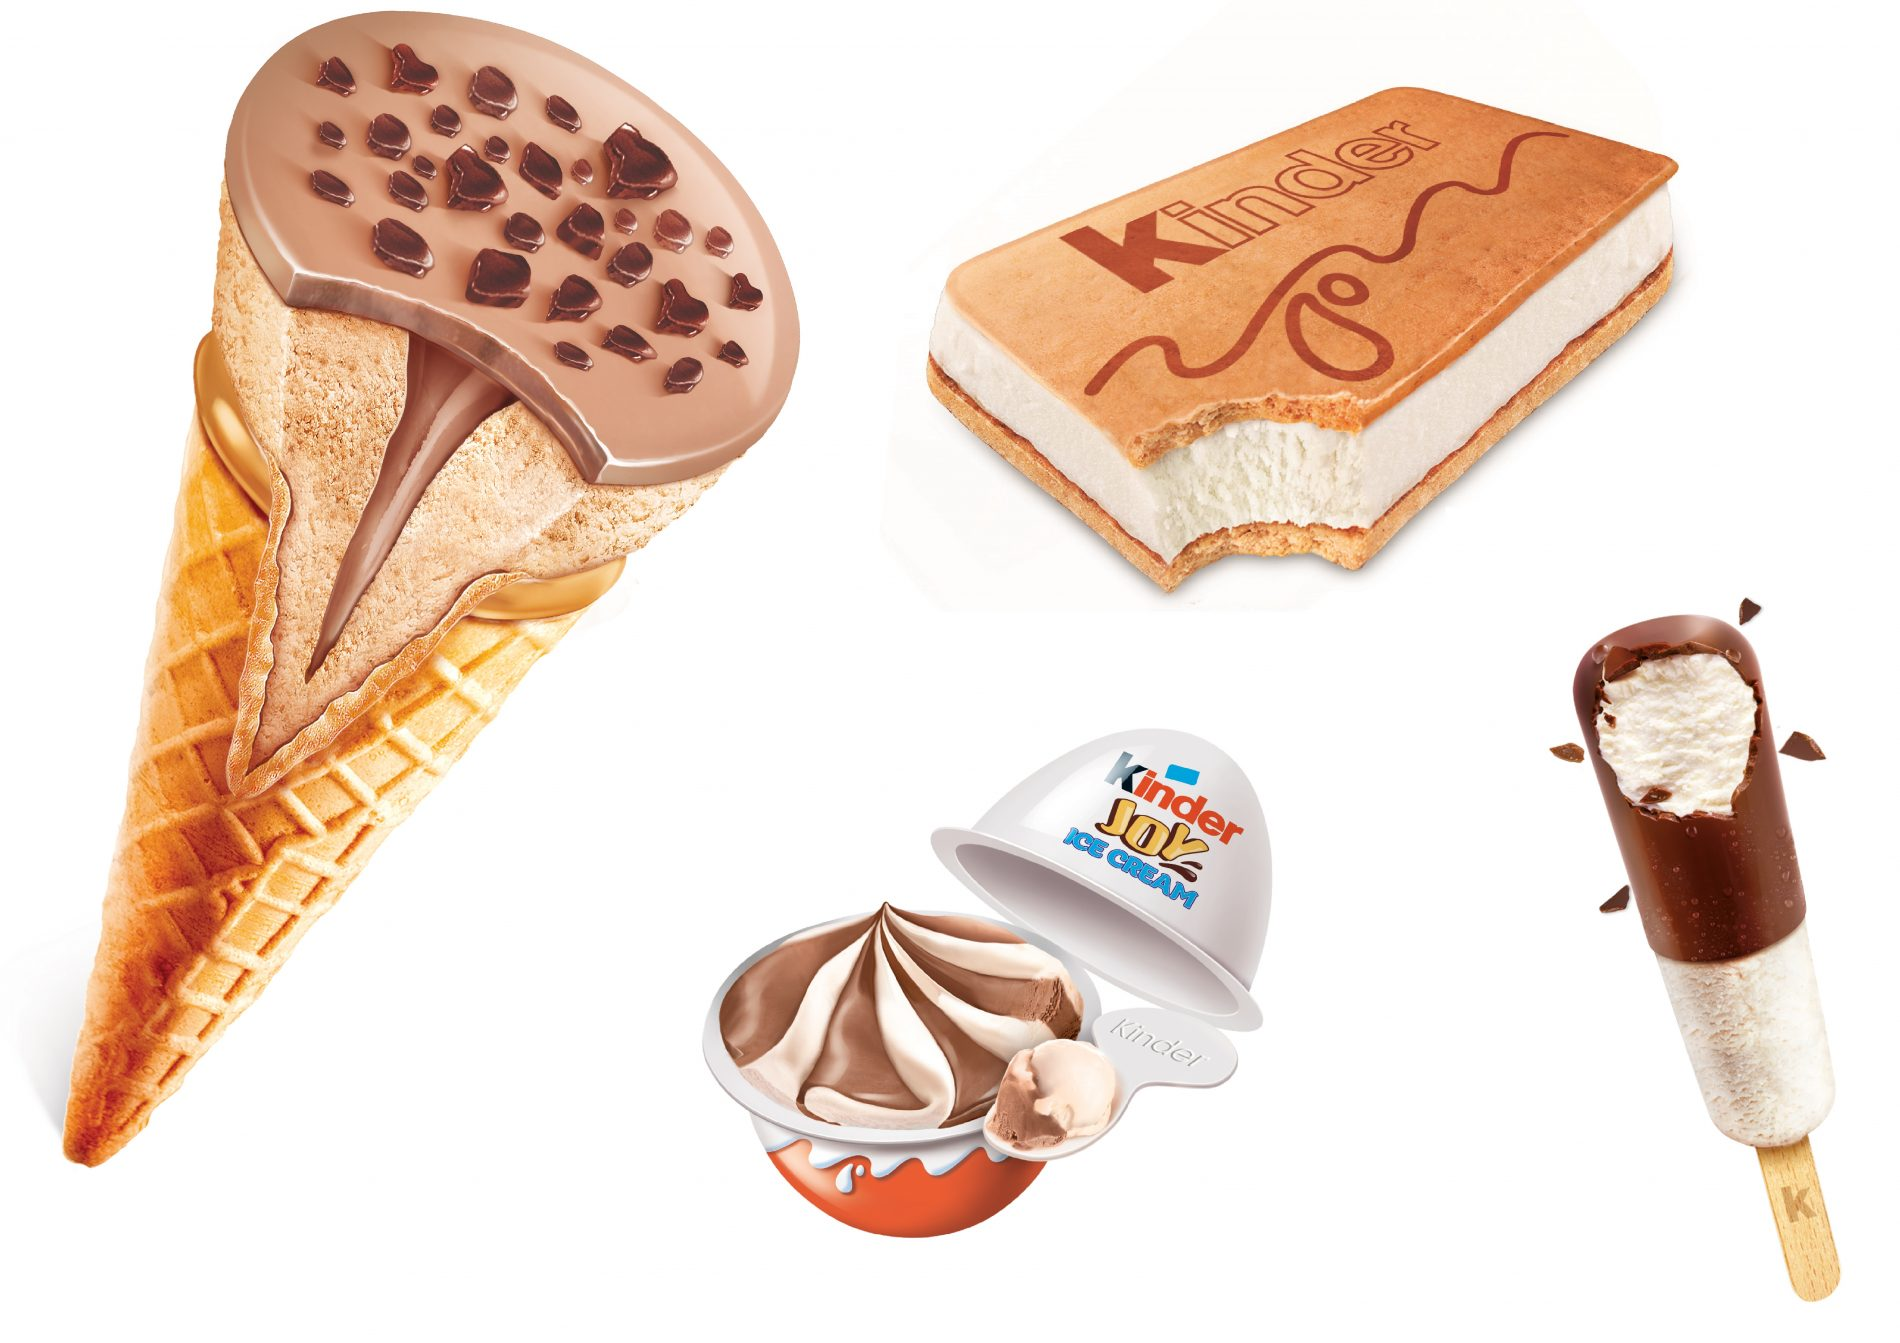 Kinder Ice Cream Range Hits Uk Aisles Feast Magazine